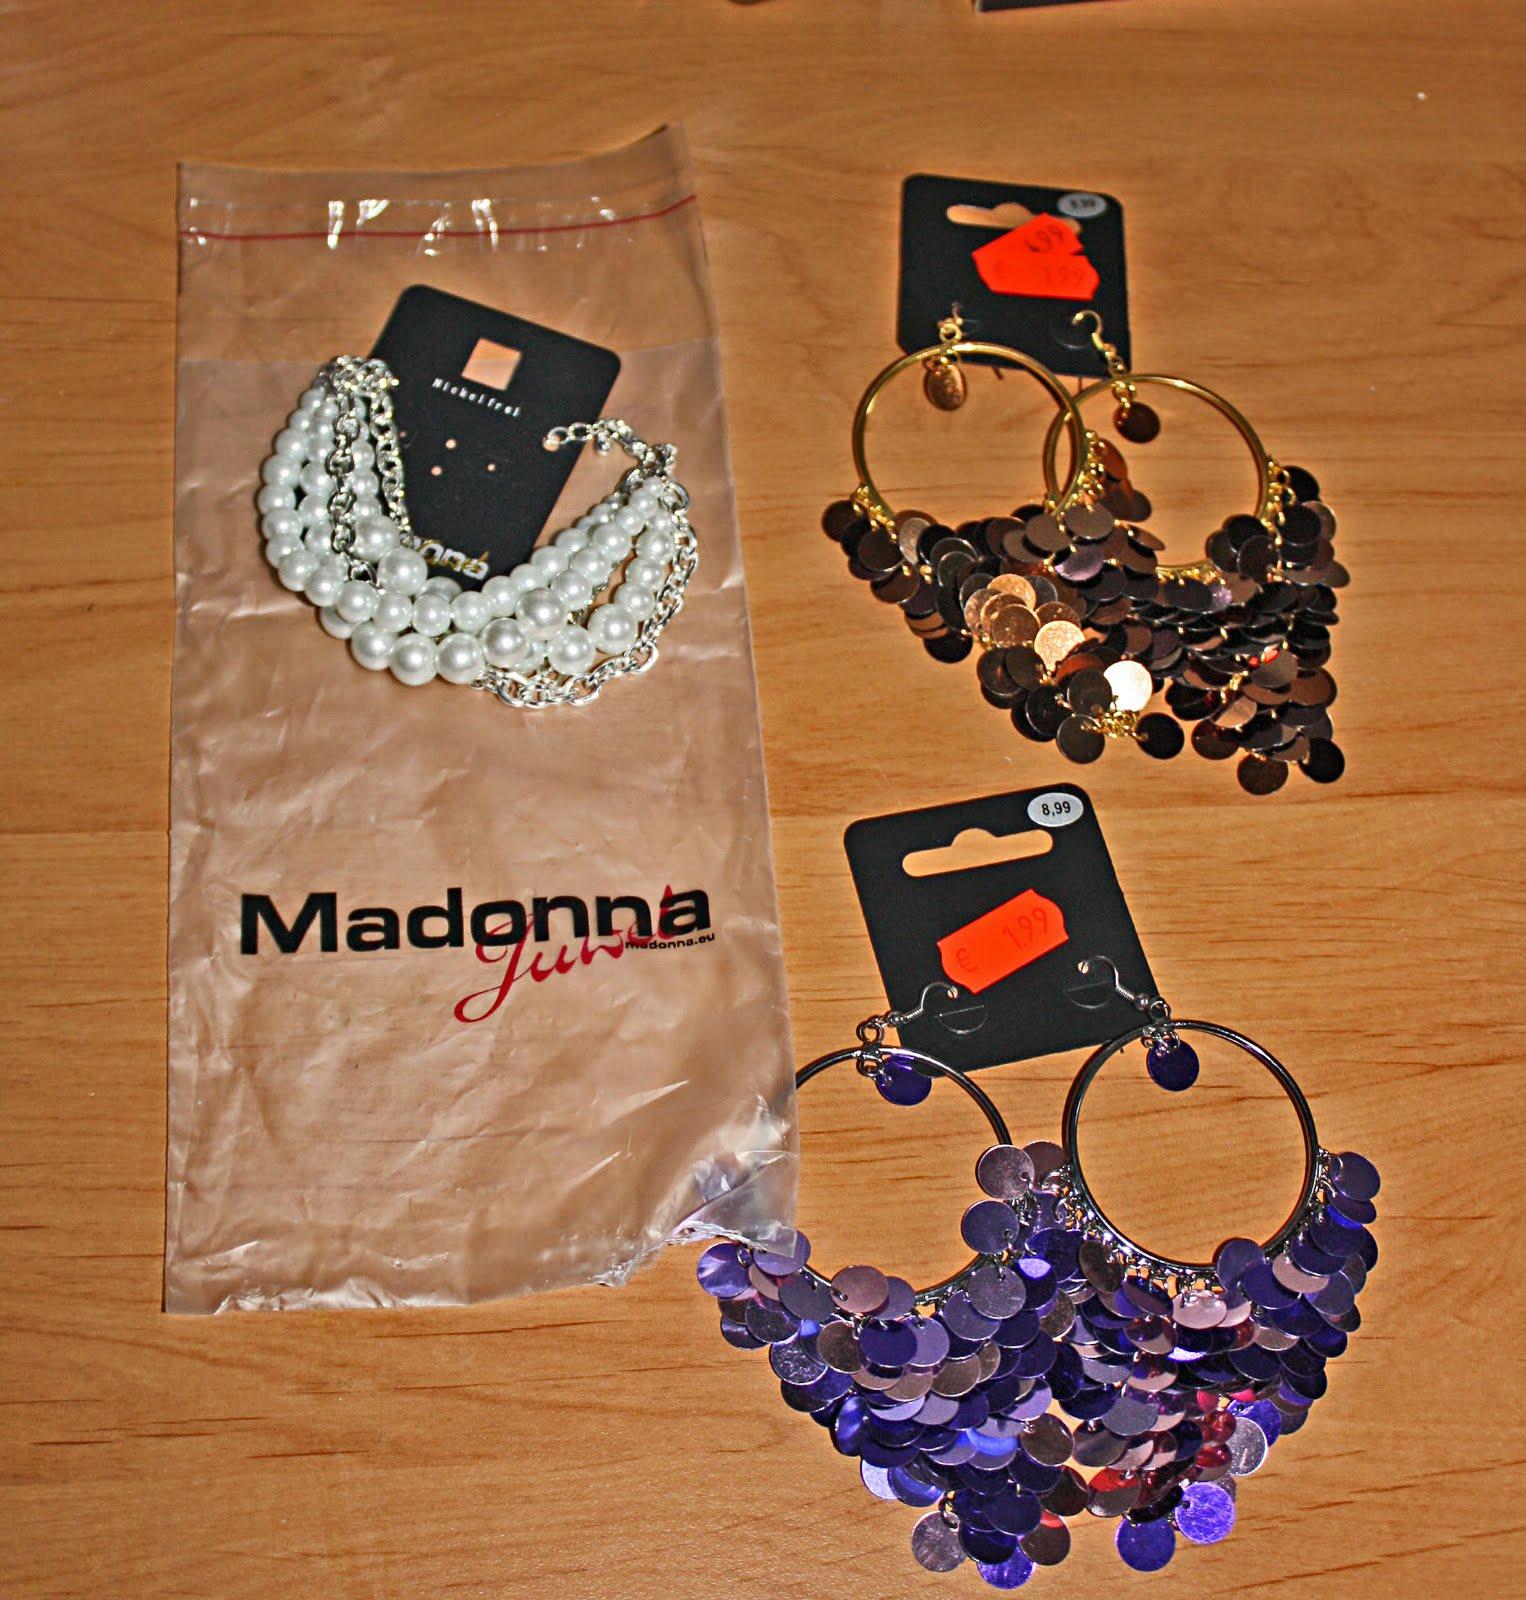 http://2.bp.blogspot.com/_41UFRrACij8/TJOFhb-LuZI/AAAAAAAABYA/WsWJTdWgZ_k/s1600/madonna.jpg